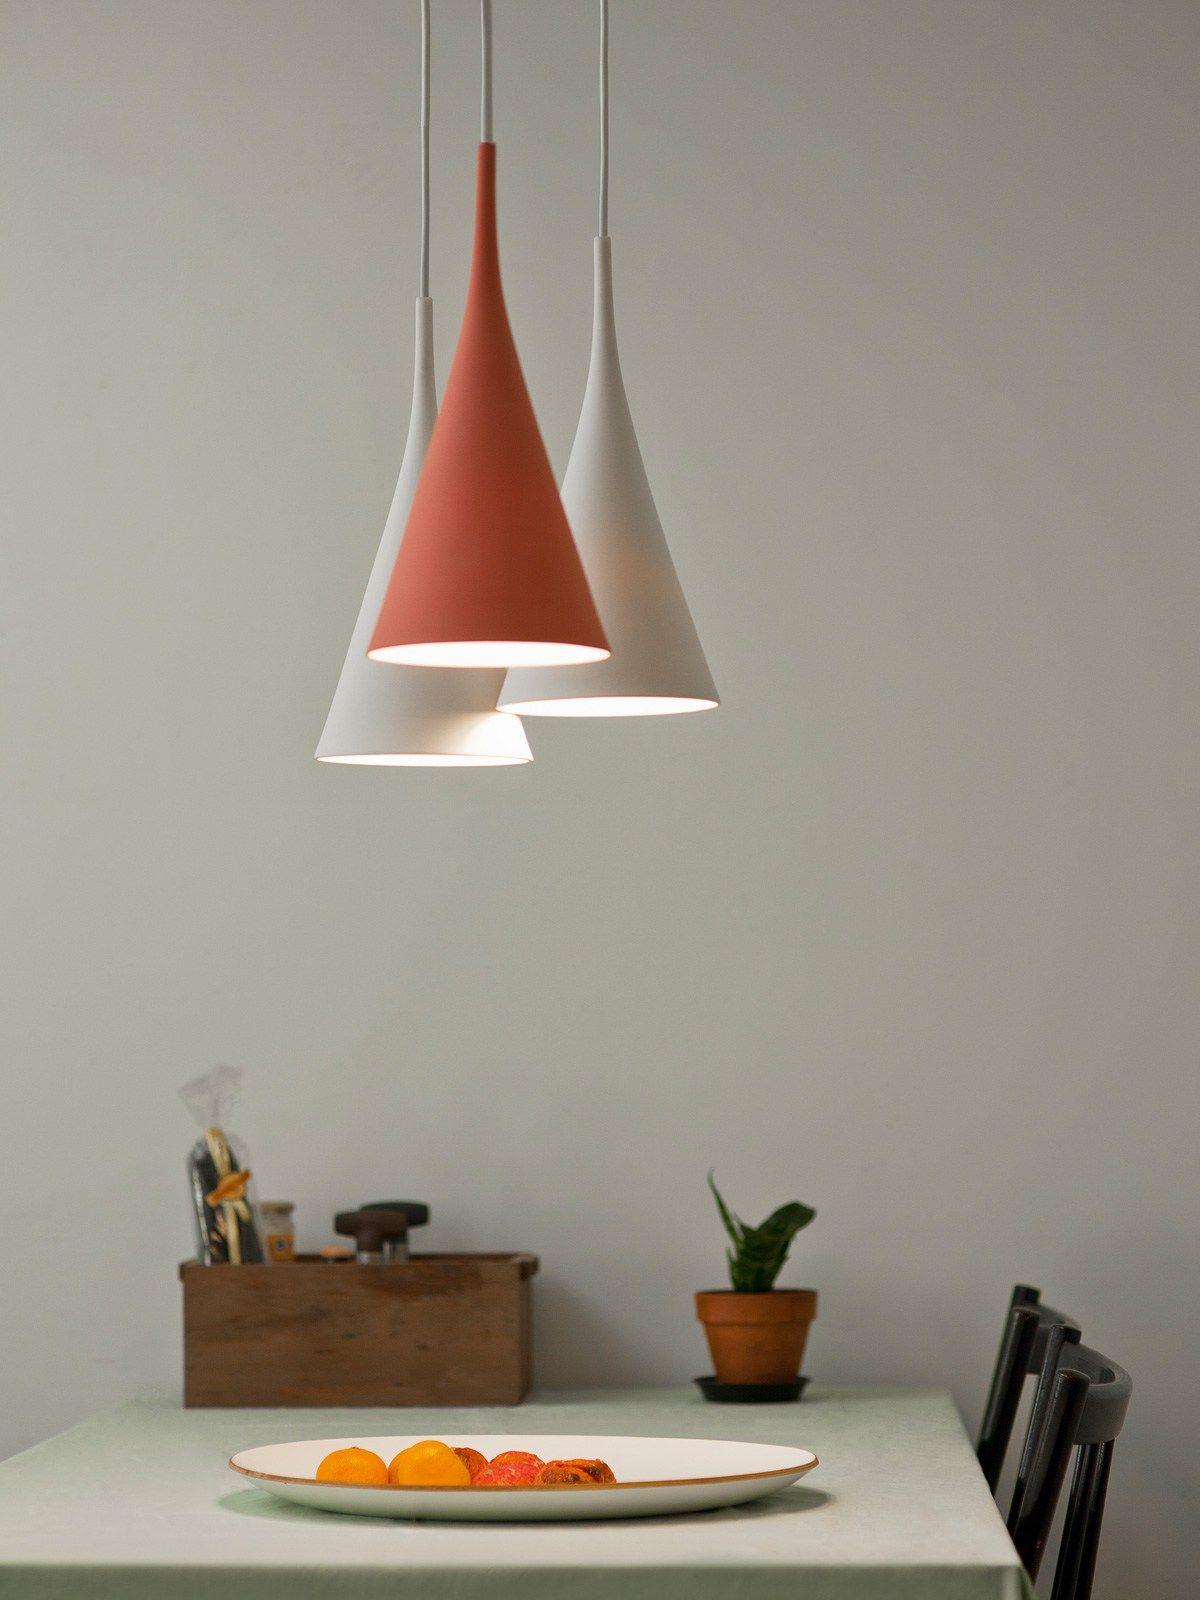 Lambada   Skandinavisches esszimmer, Pendelleuchten design, Anhänger lampen